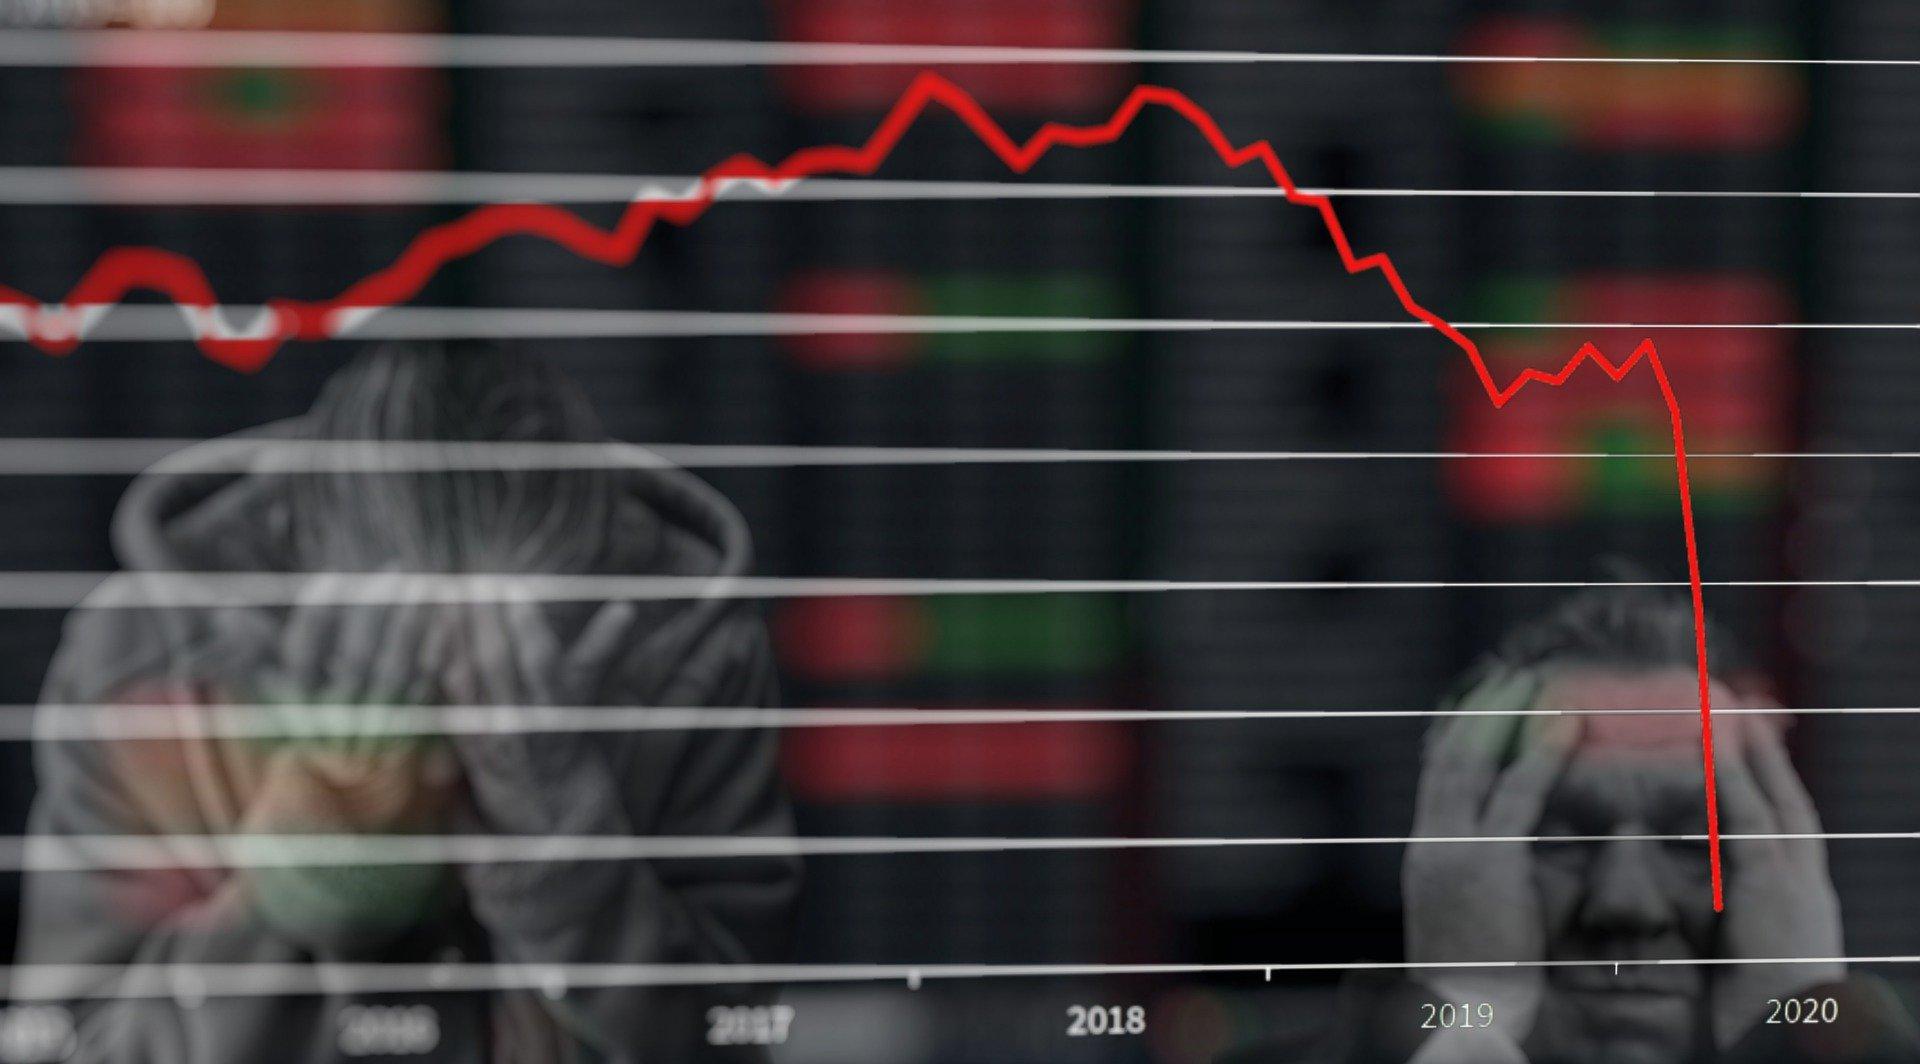 Recession stock market bear market